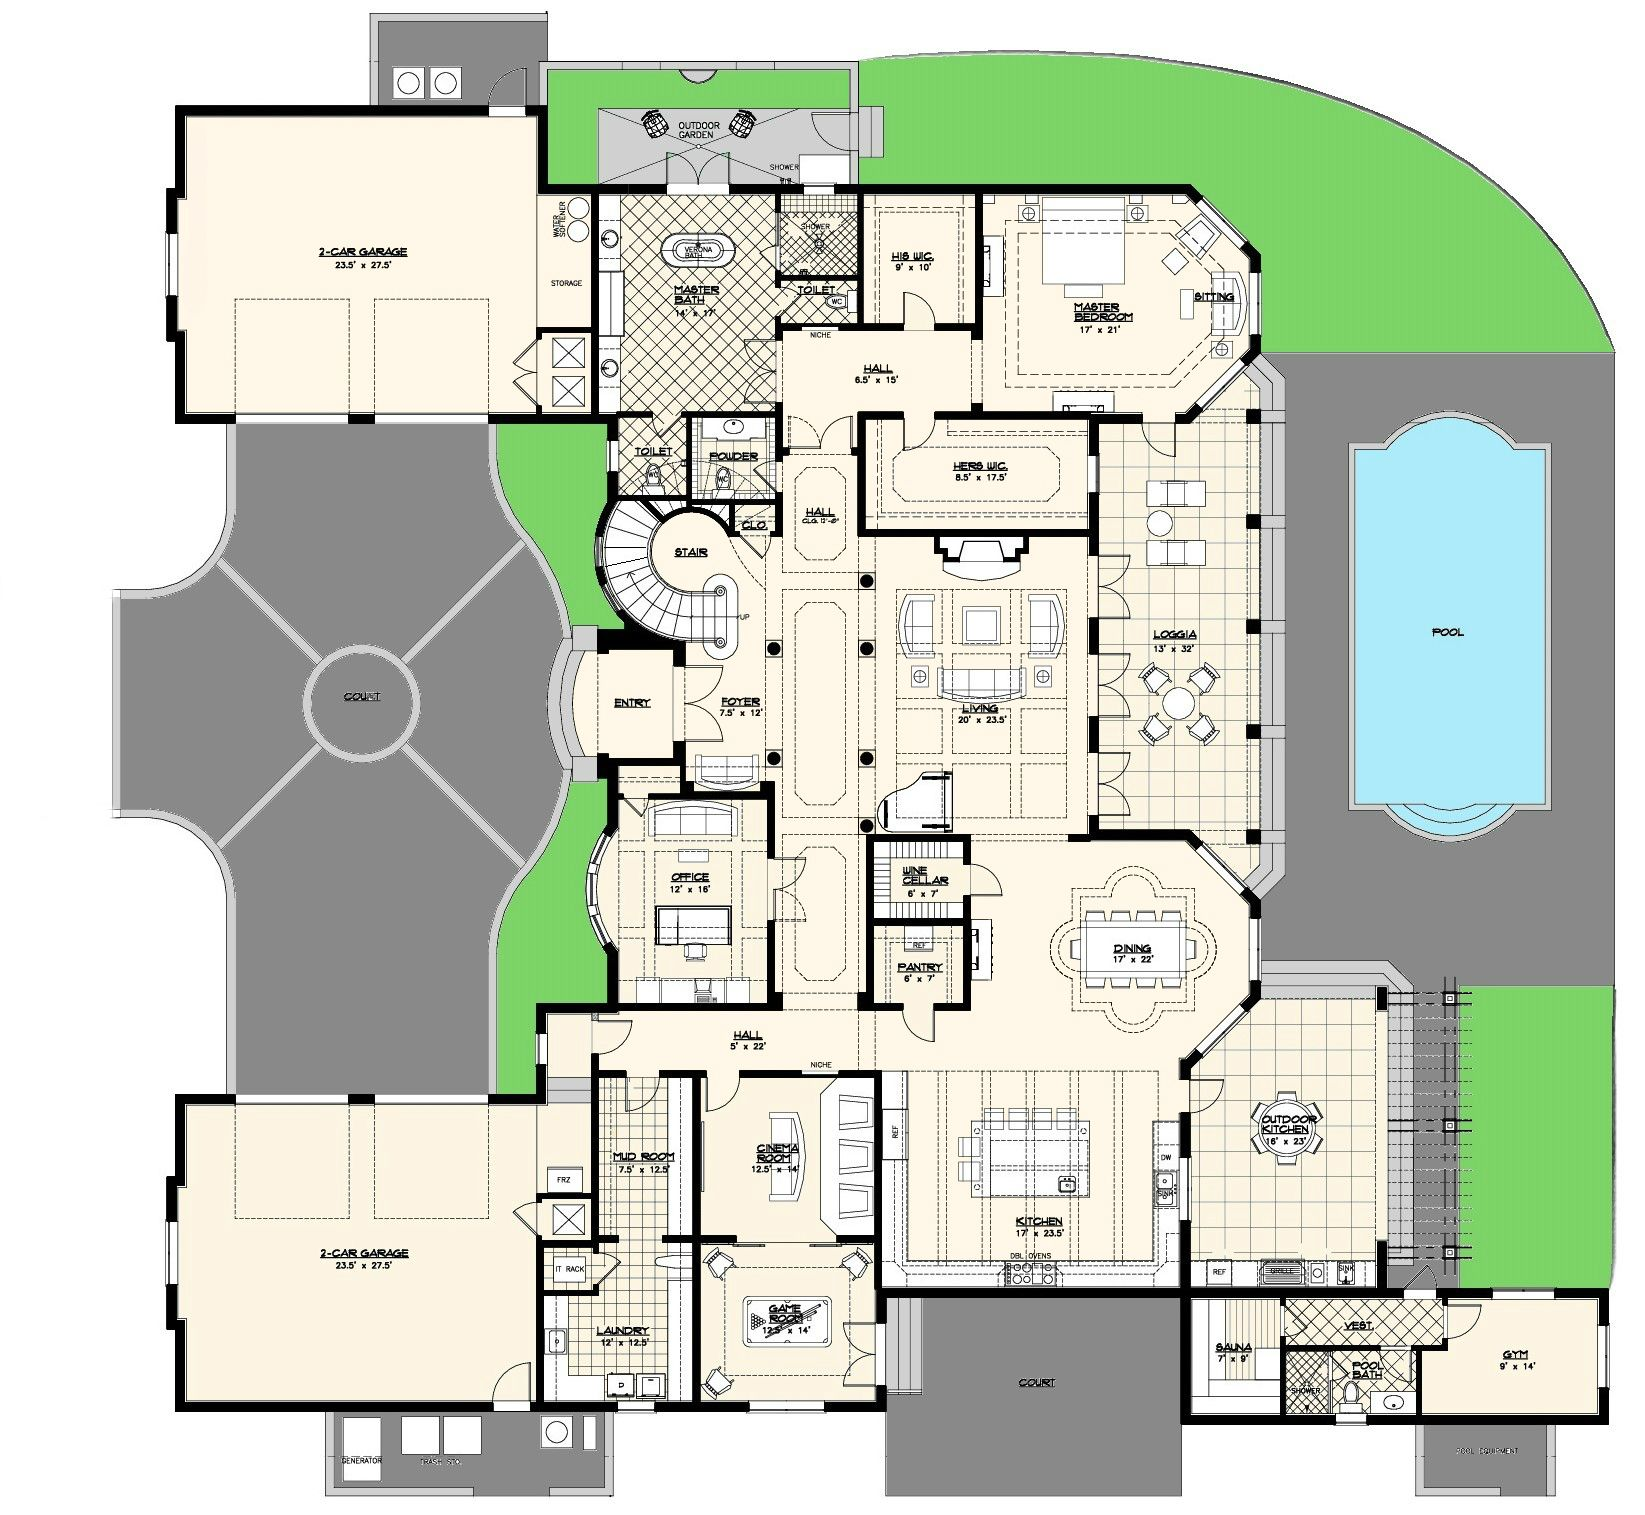 Http Alphabuildersgroup Com Wp Content Uploads 2016 04 Alpha Builders Group Villa Marina 1st Floor 5bd 6 5bt 6613sf Ac Luxury Custom Home Floor Plan Jacksonvi